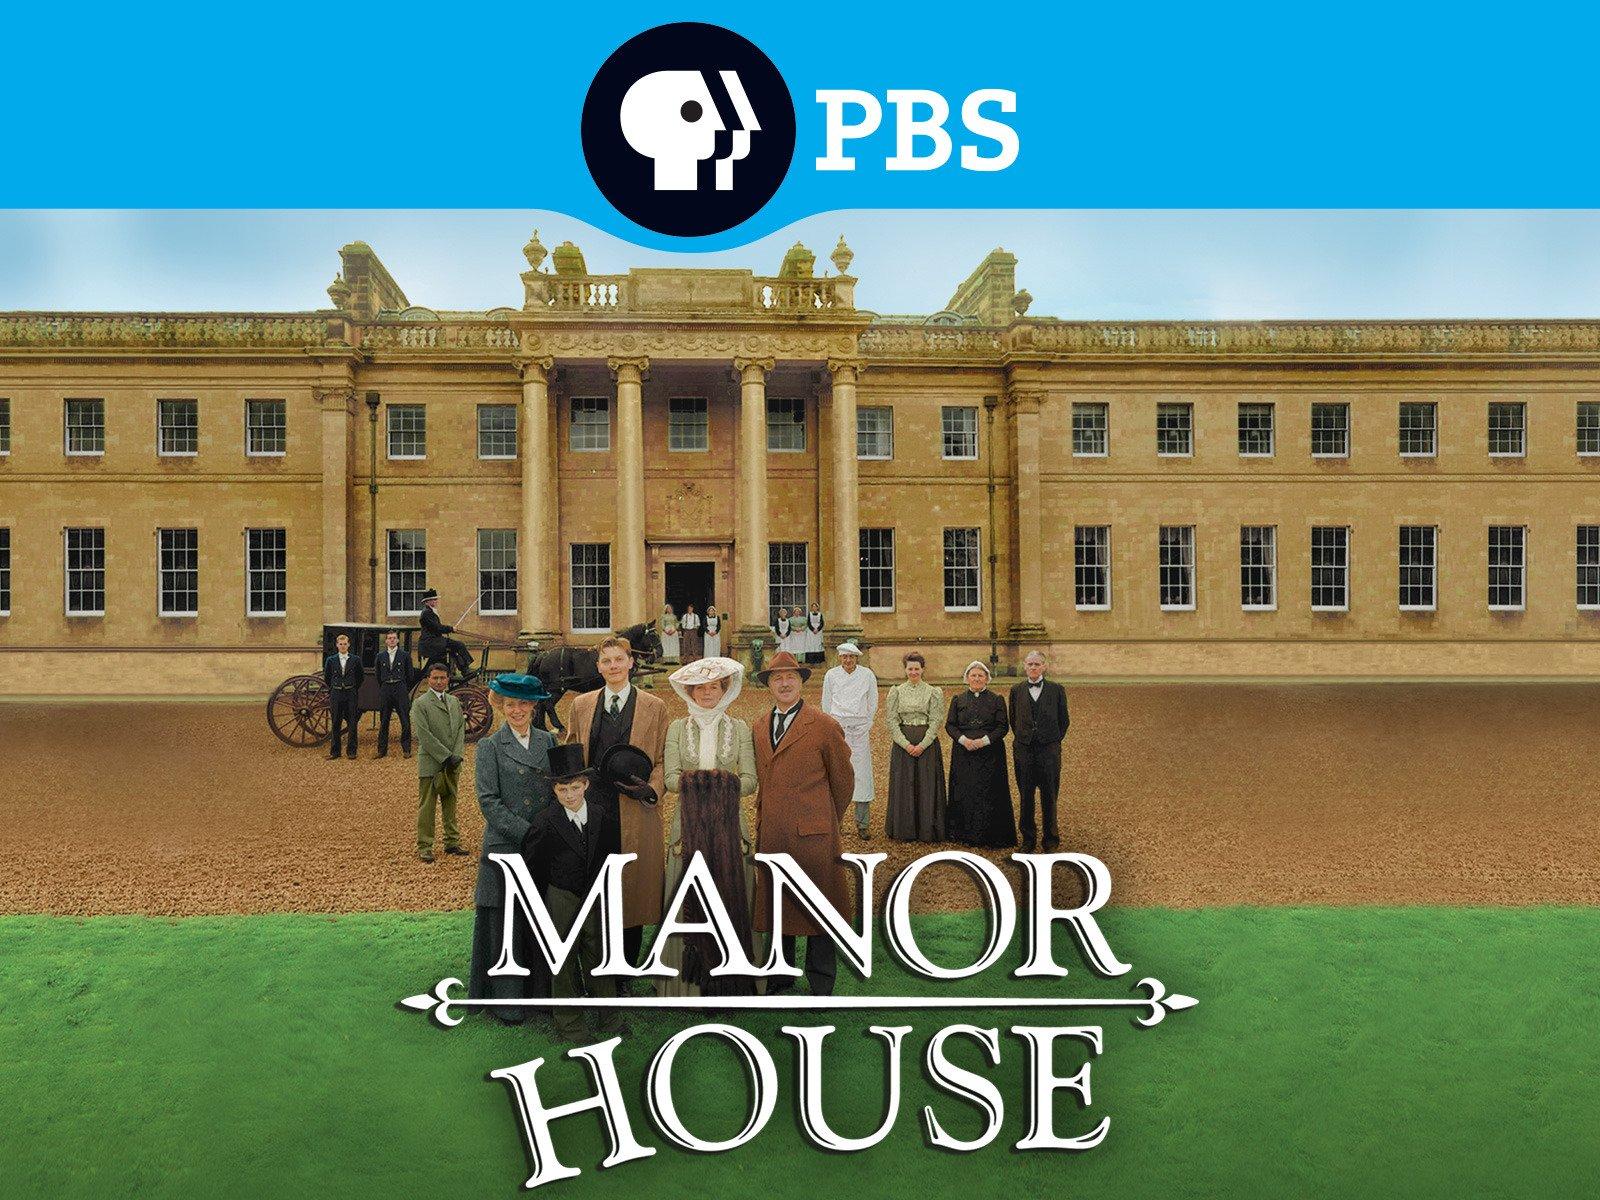 Manor house photo